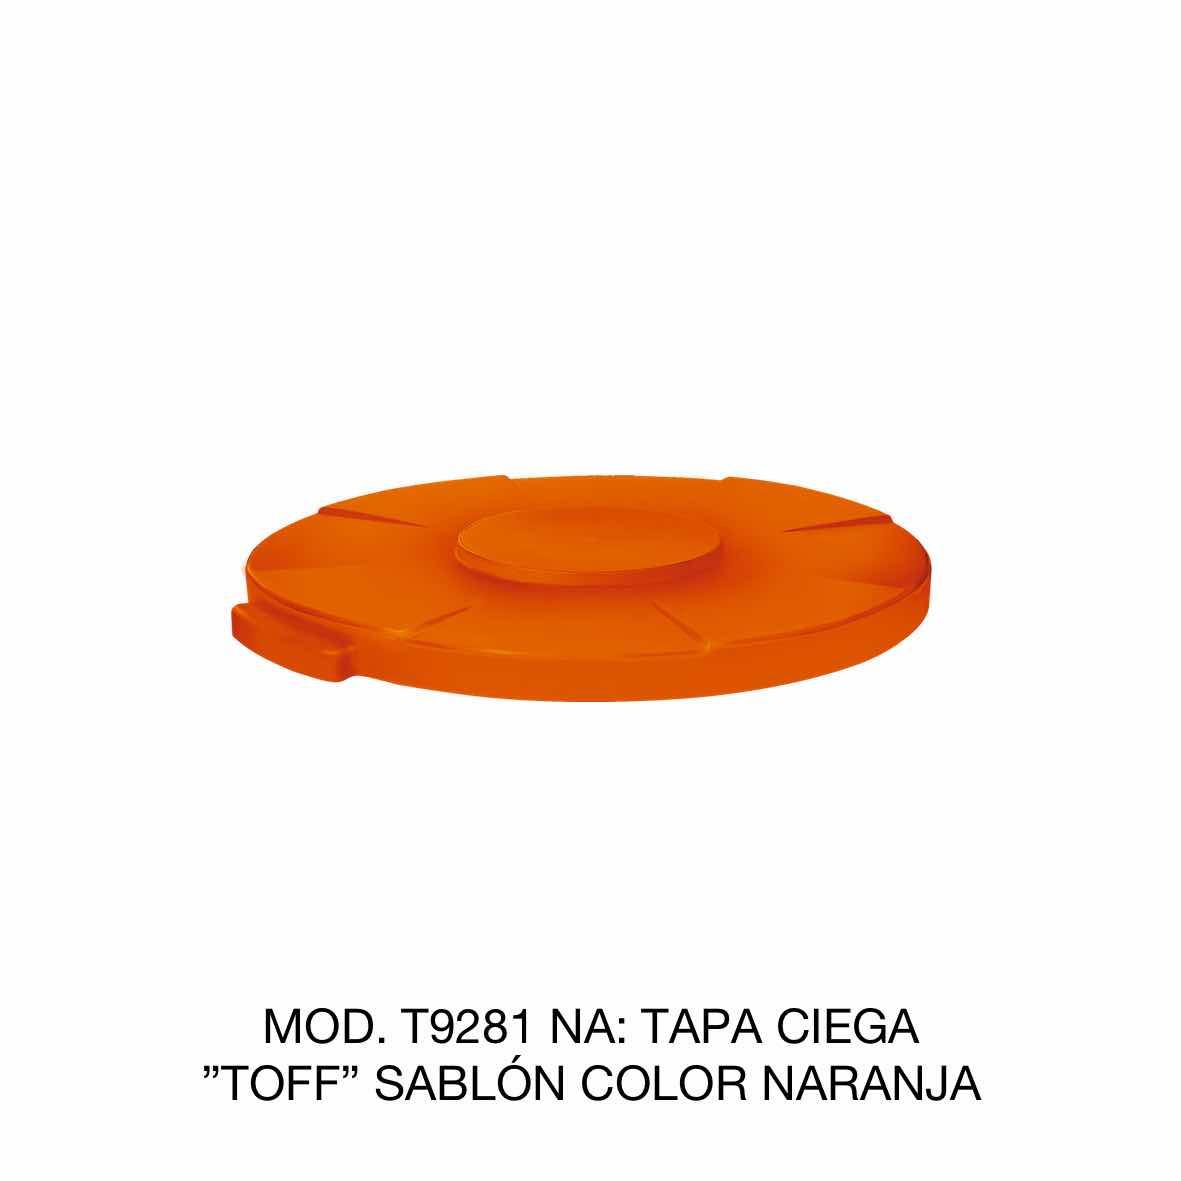 Tapa para contenedor de basura de 120 litros TOFF modelo T9281 NA color naranja de Sablón